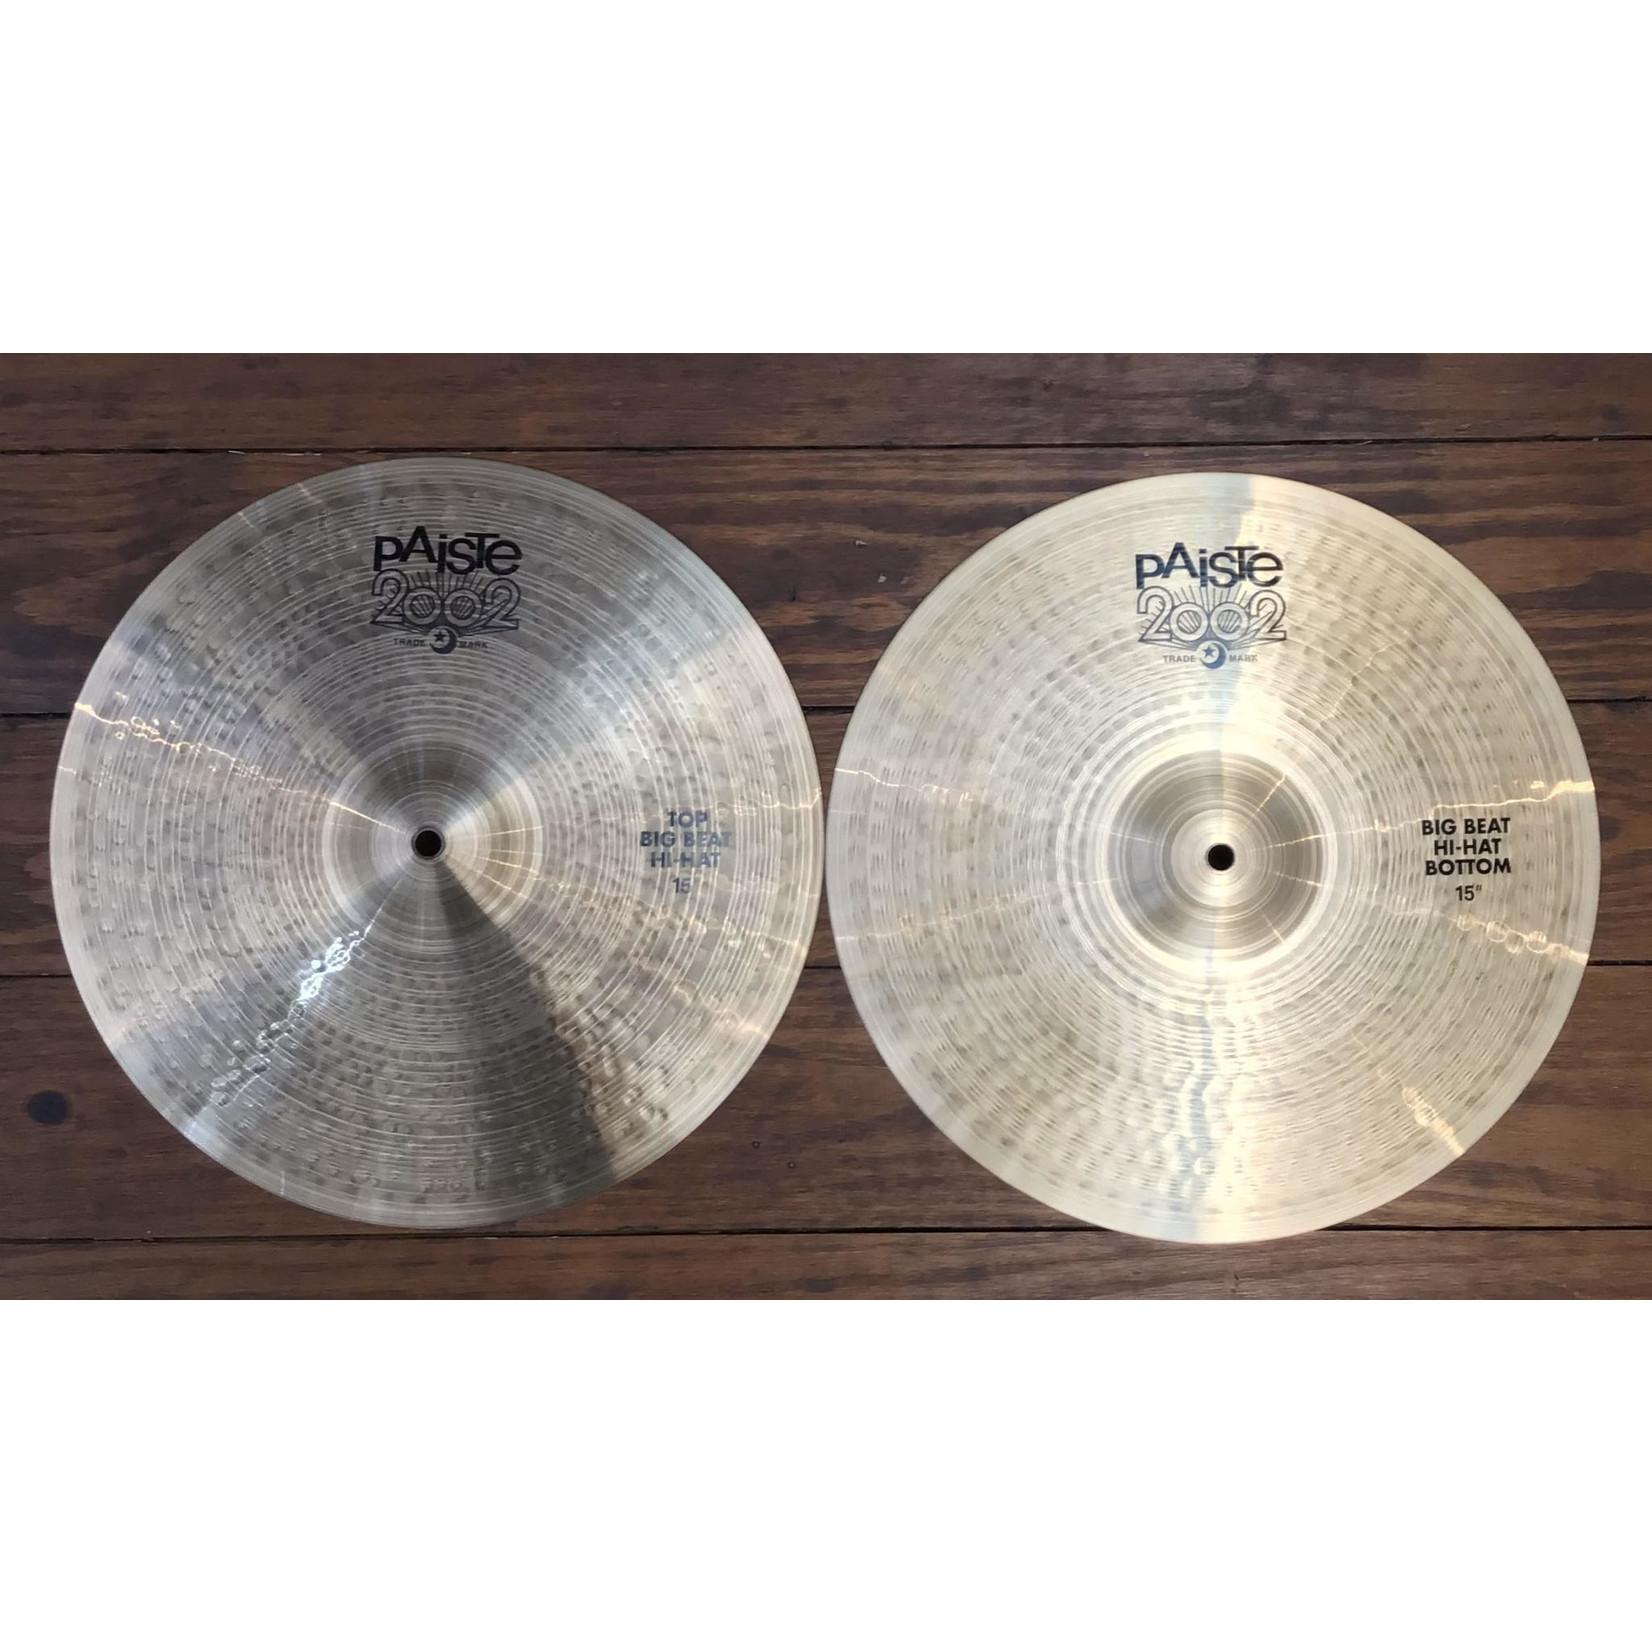 "Paiste USED Paiste Big Beat 15"" Hi-Hat Cymbals (Pair)"